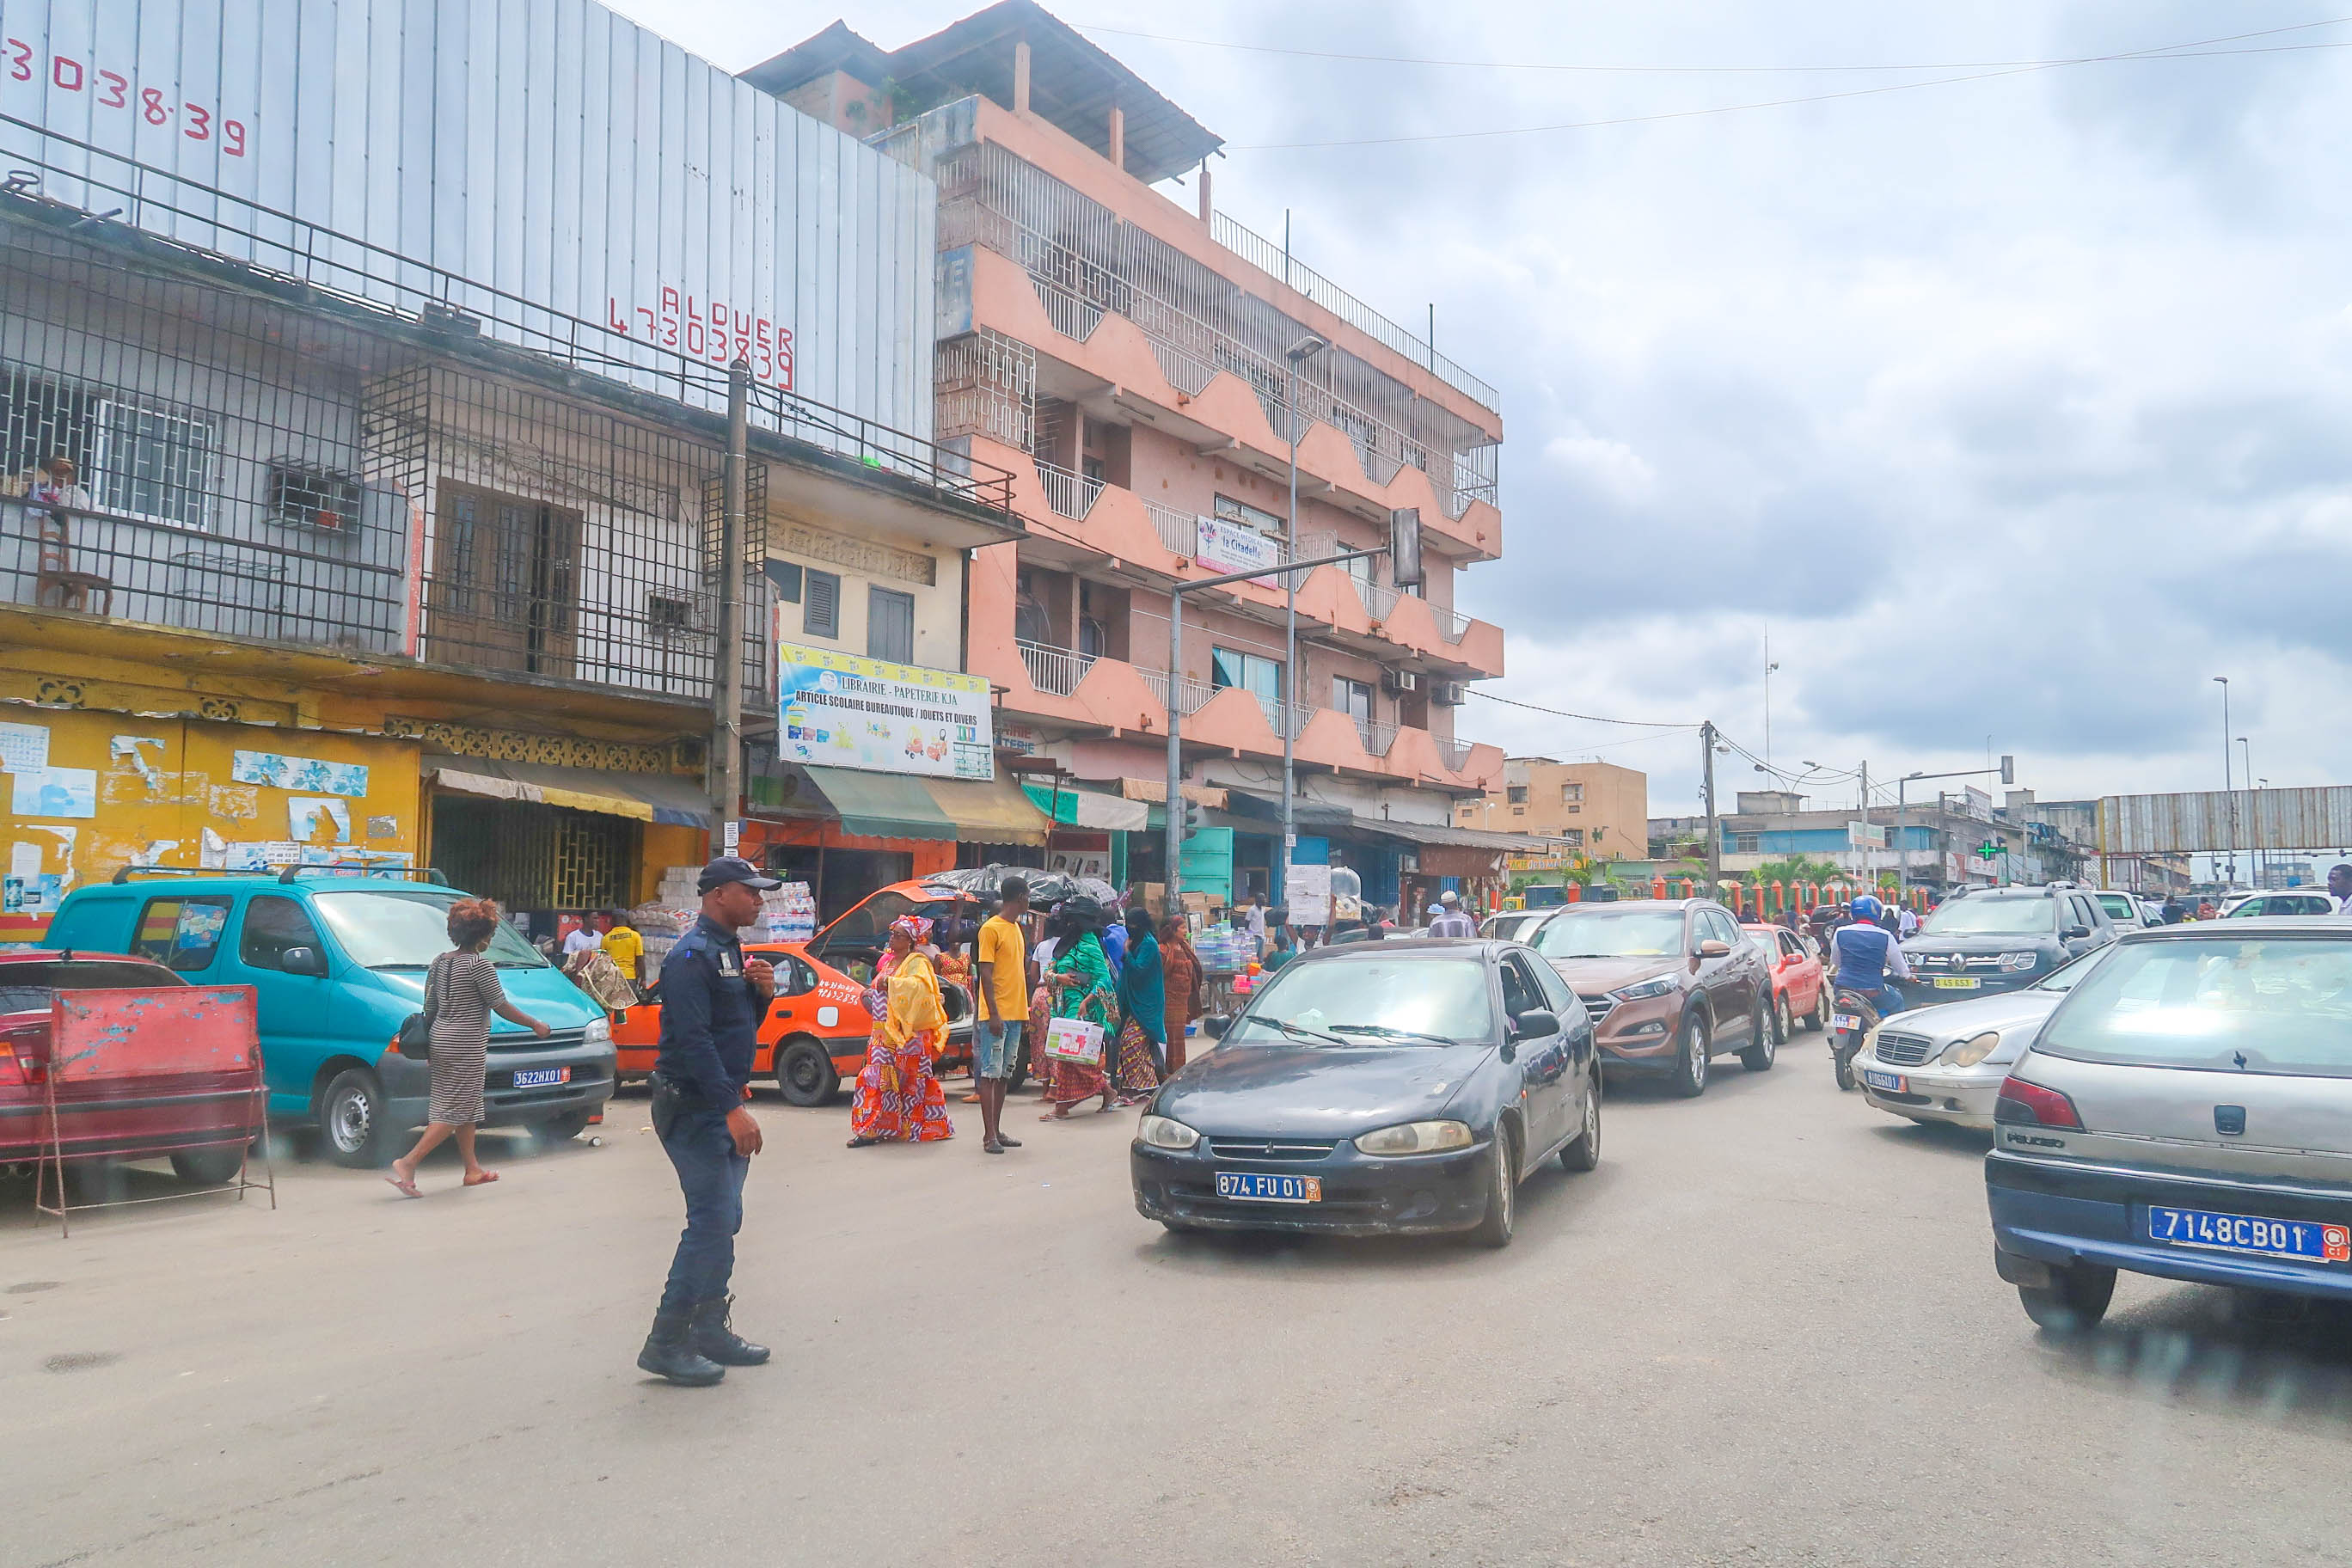 The streets of Abidjan